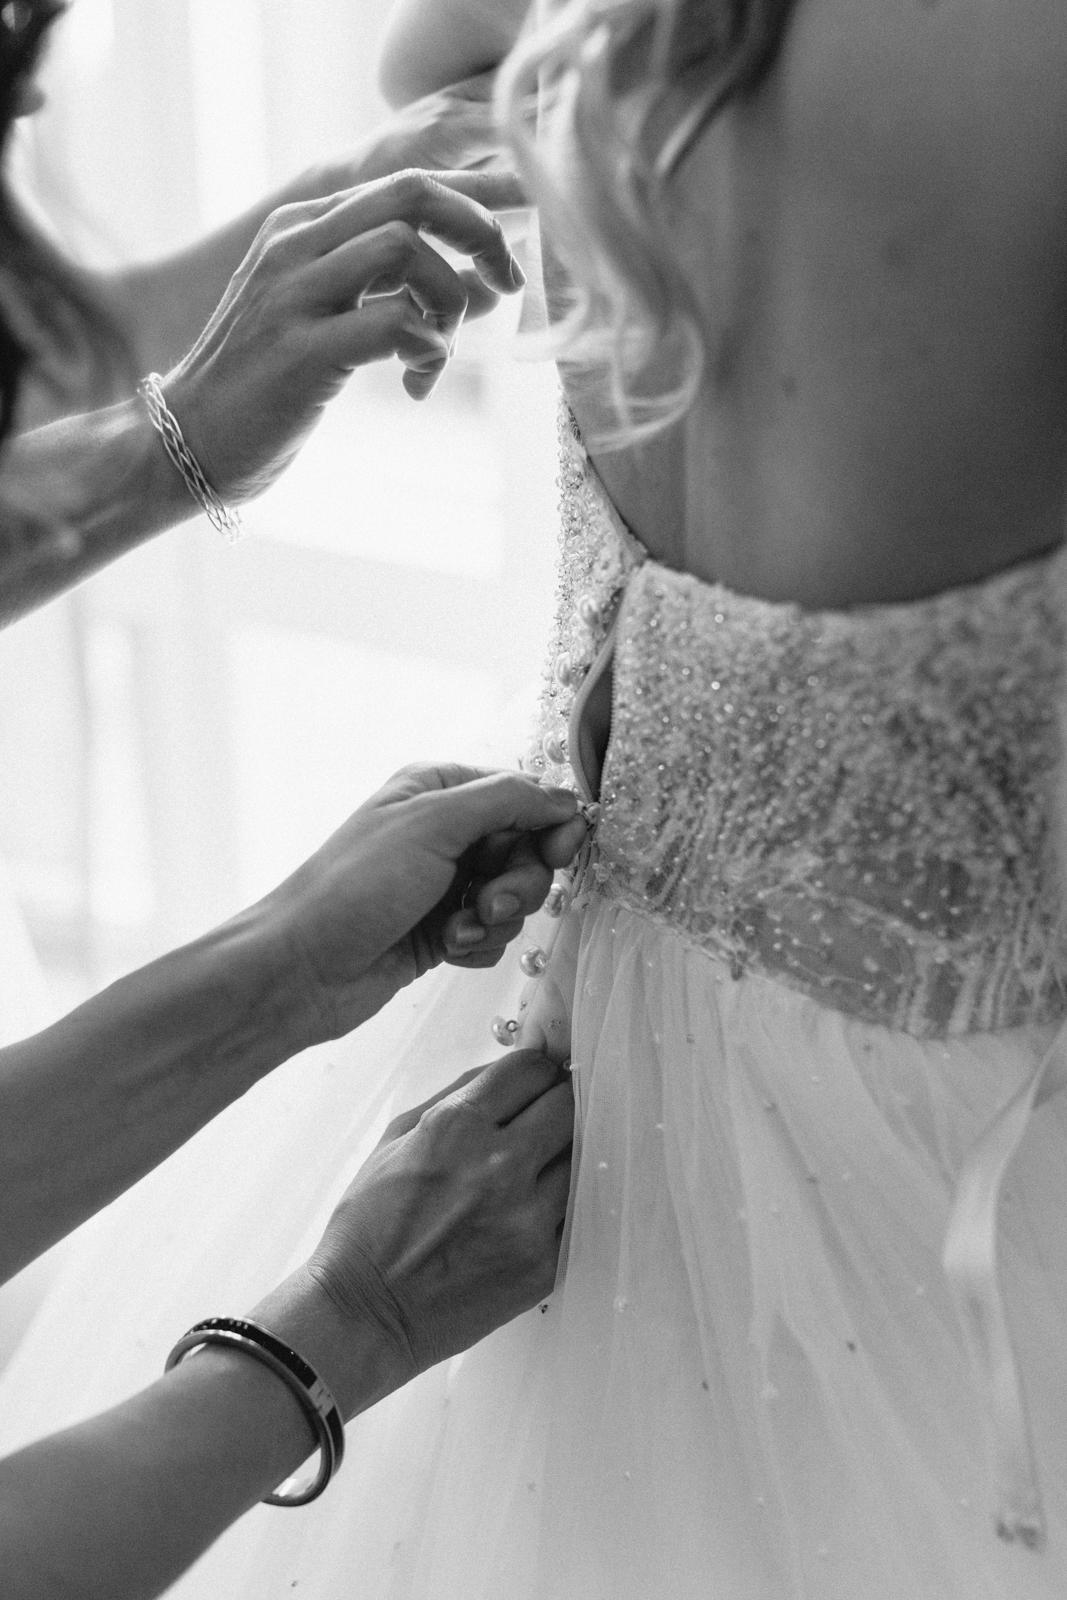 NYC Wedding Photography Sofitel Central Park Brooklyn Photographer Boris Zaretsky _B2C1846.jpg